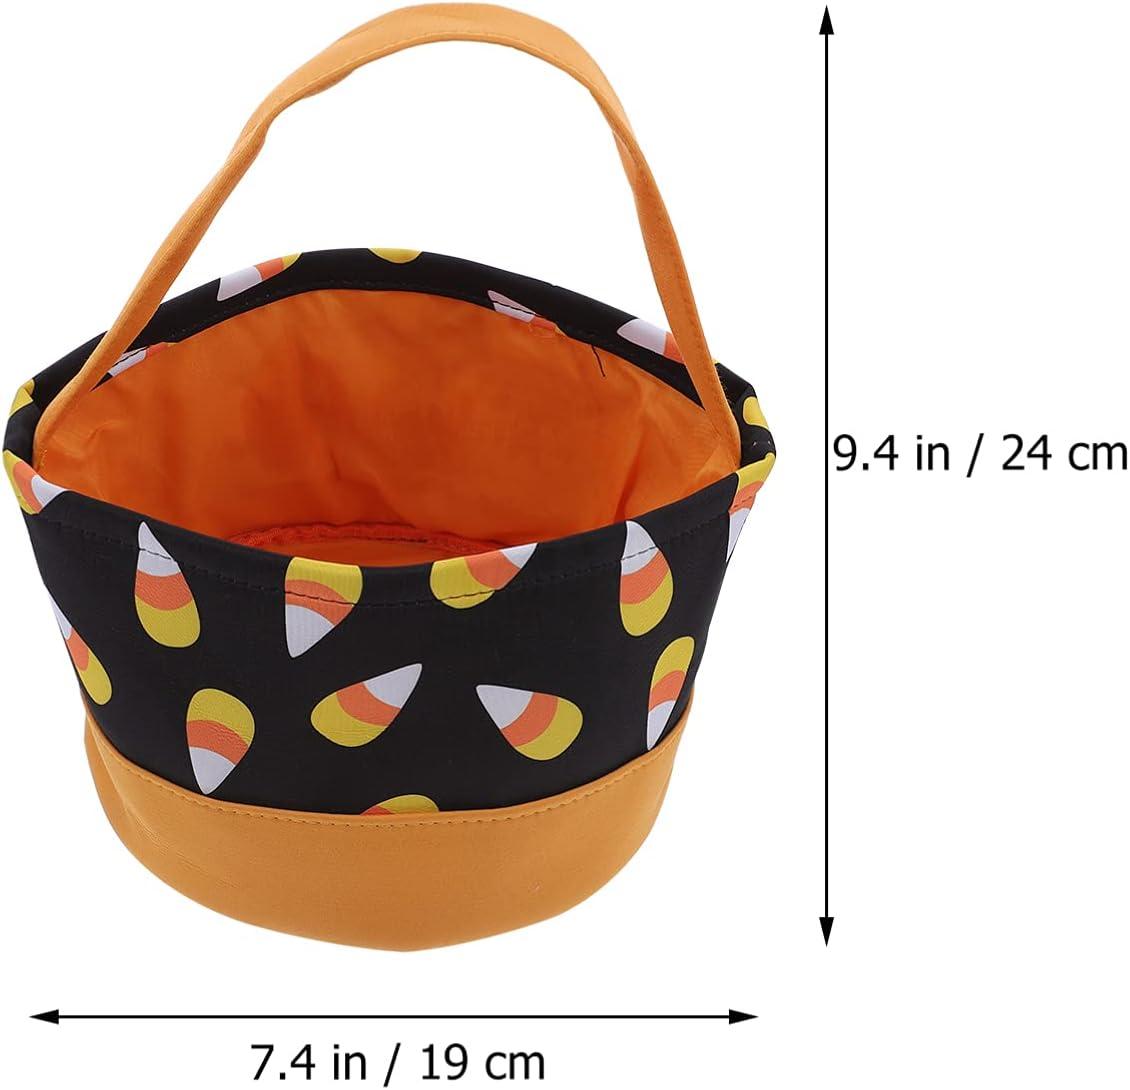 Amosfun Halloween Trick Or Treat Bag Halloween Candy Bucket Pumpkin Candy Tote Bucket Halloween Costume Party Favors Supplies